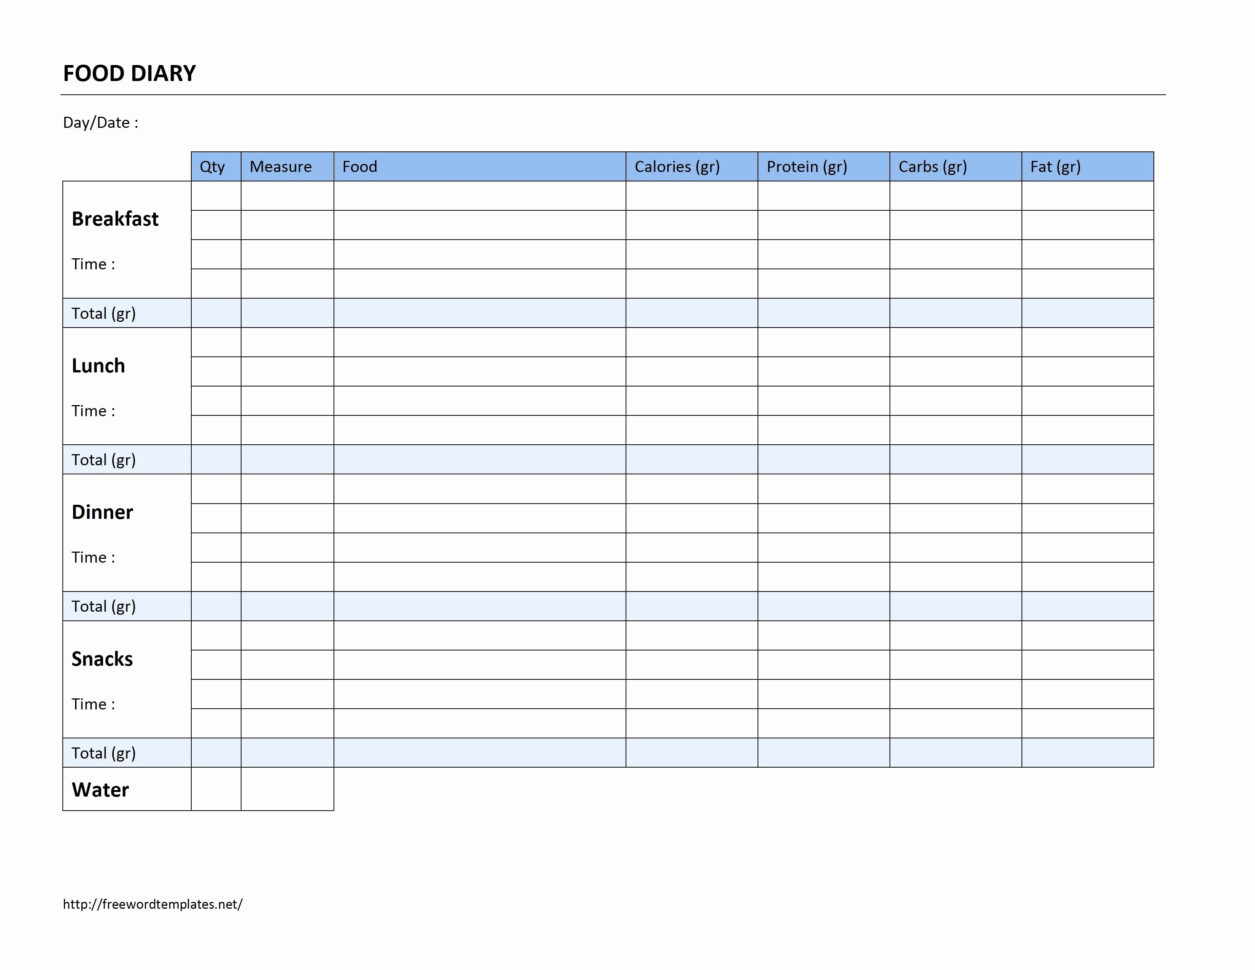 Recipe Costing Spreadsheet Google Spreadshee free recipe ...